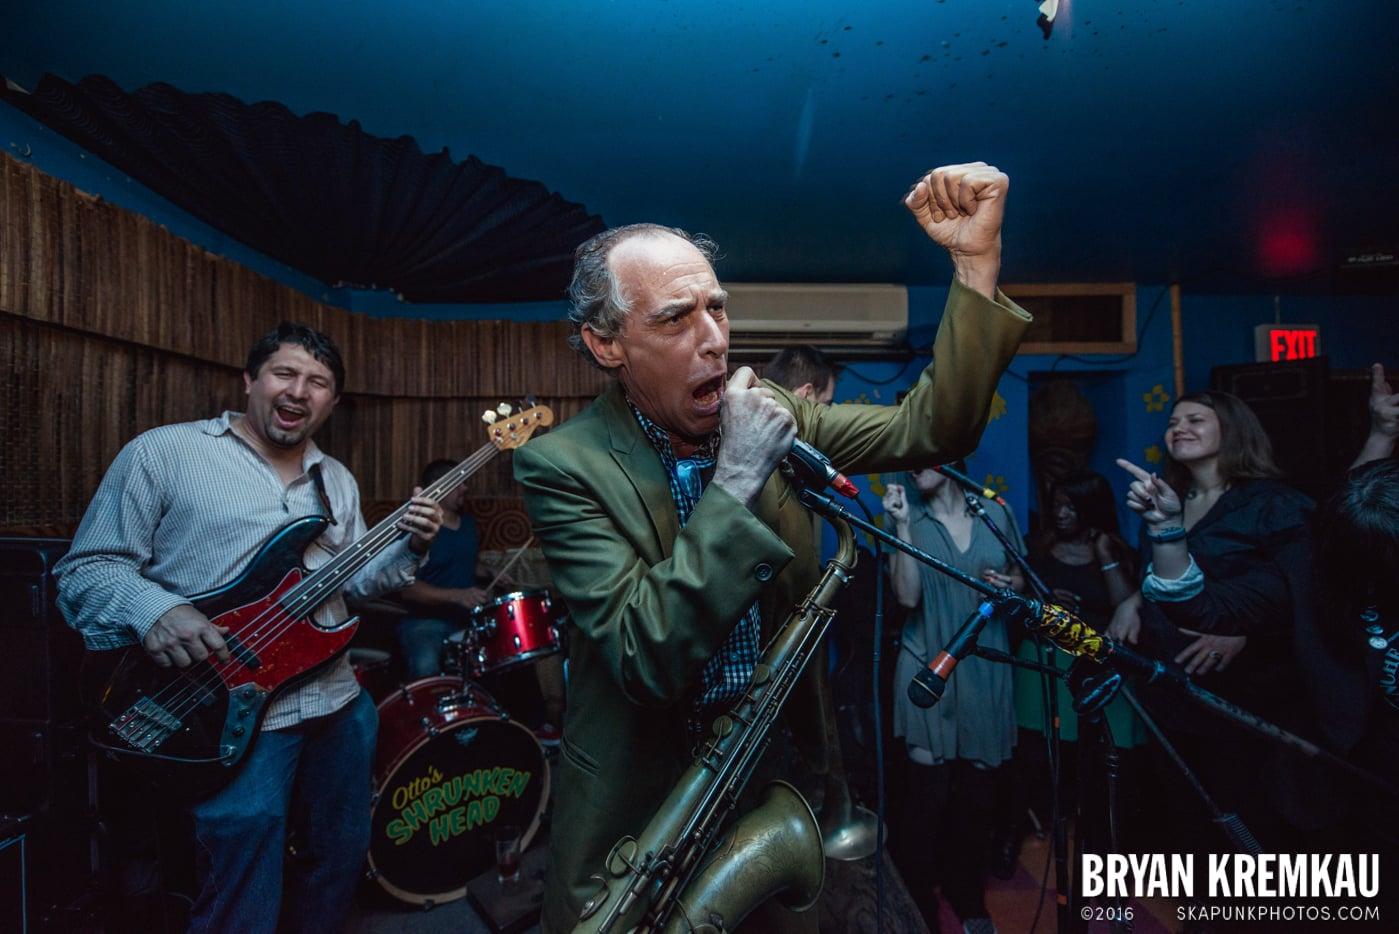 The Scofflaws @ Otto's Shrunken Head, NYC - 12.5.14 (13)